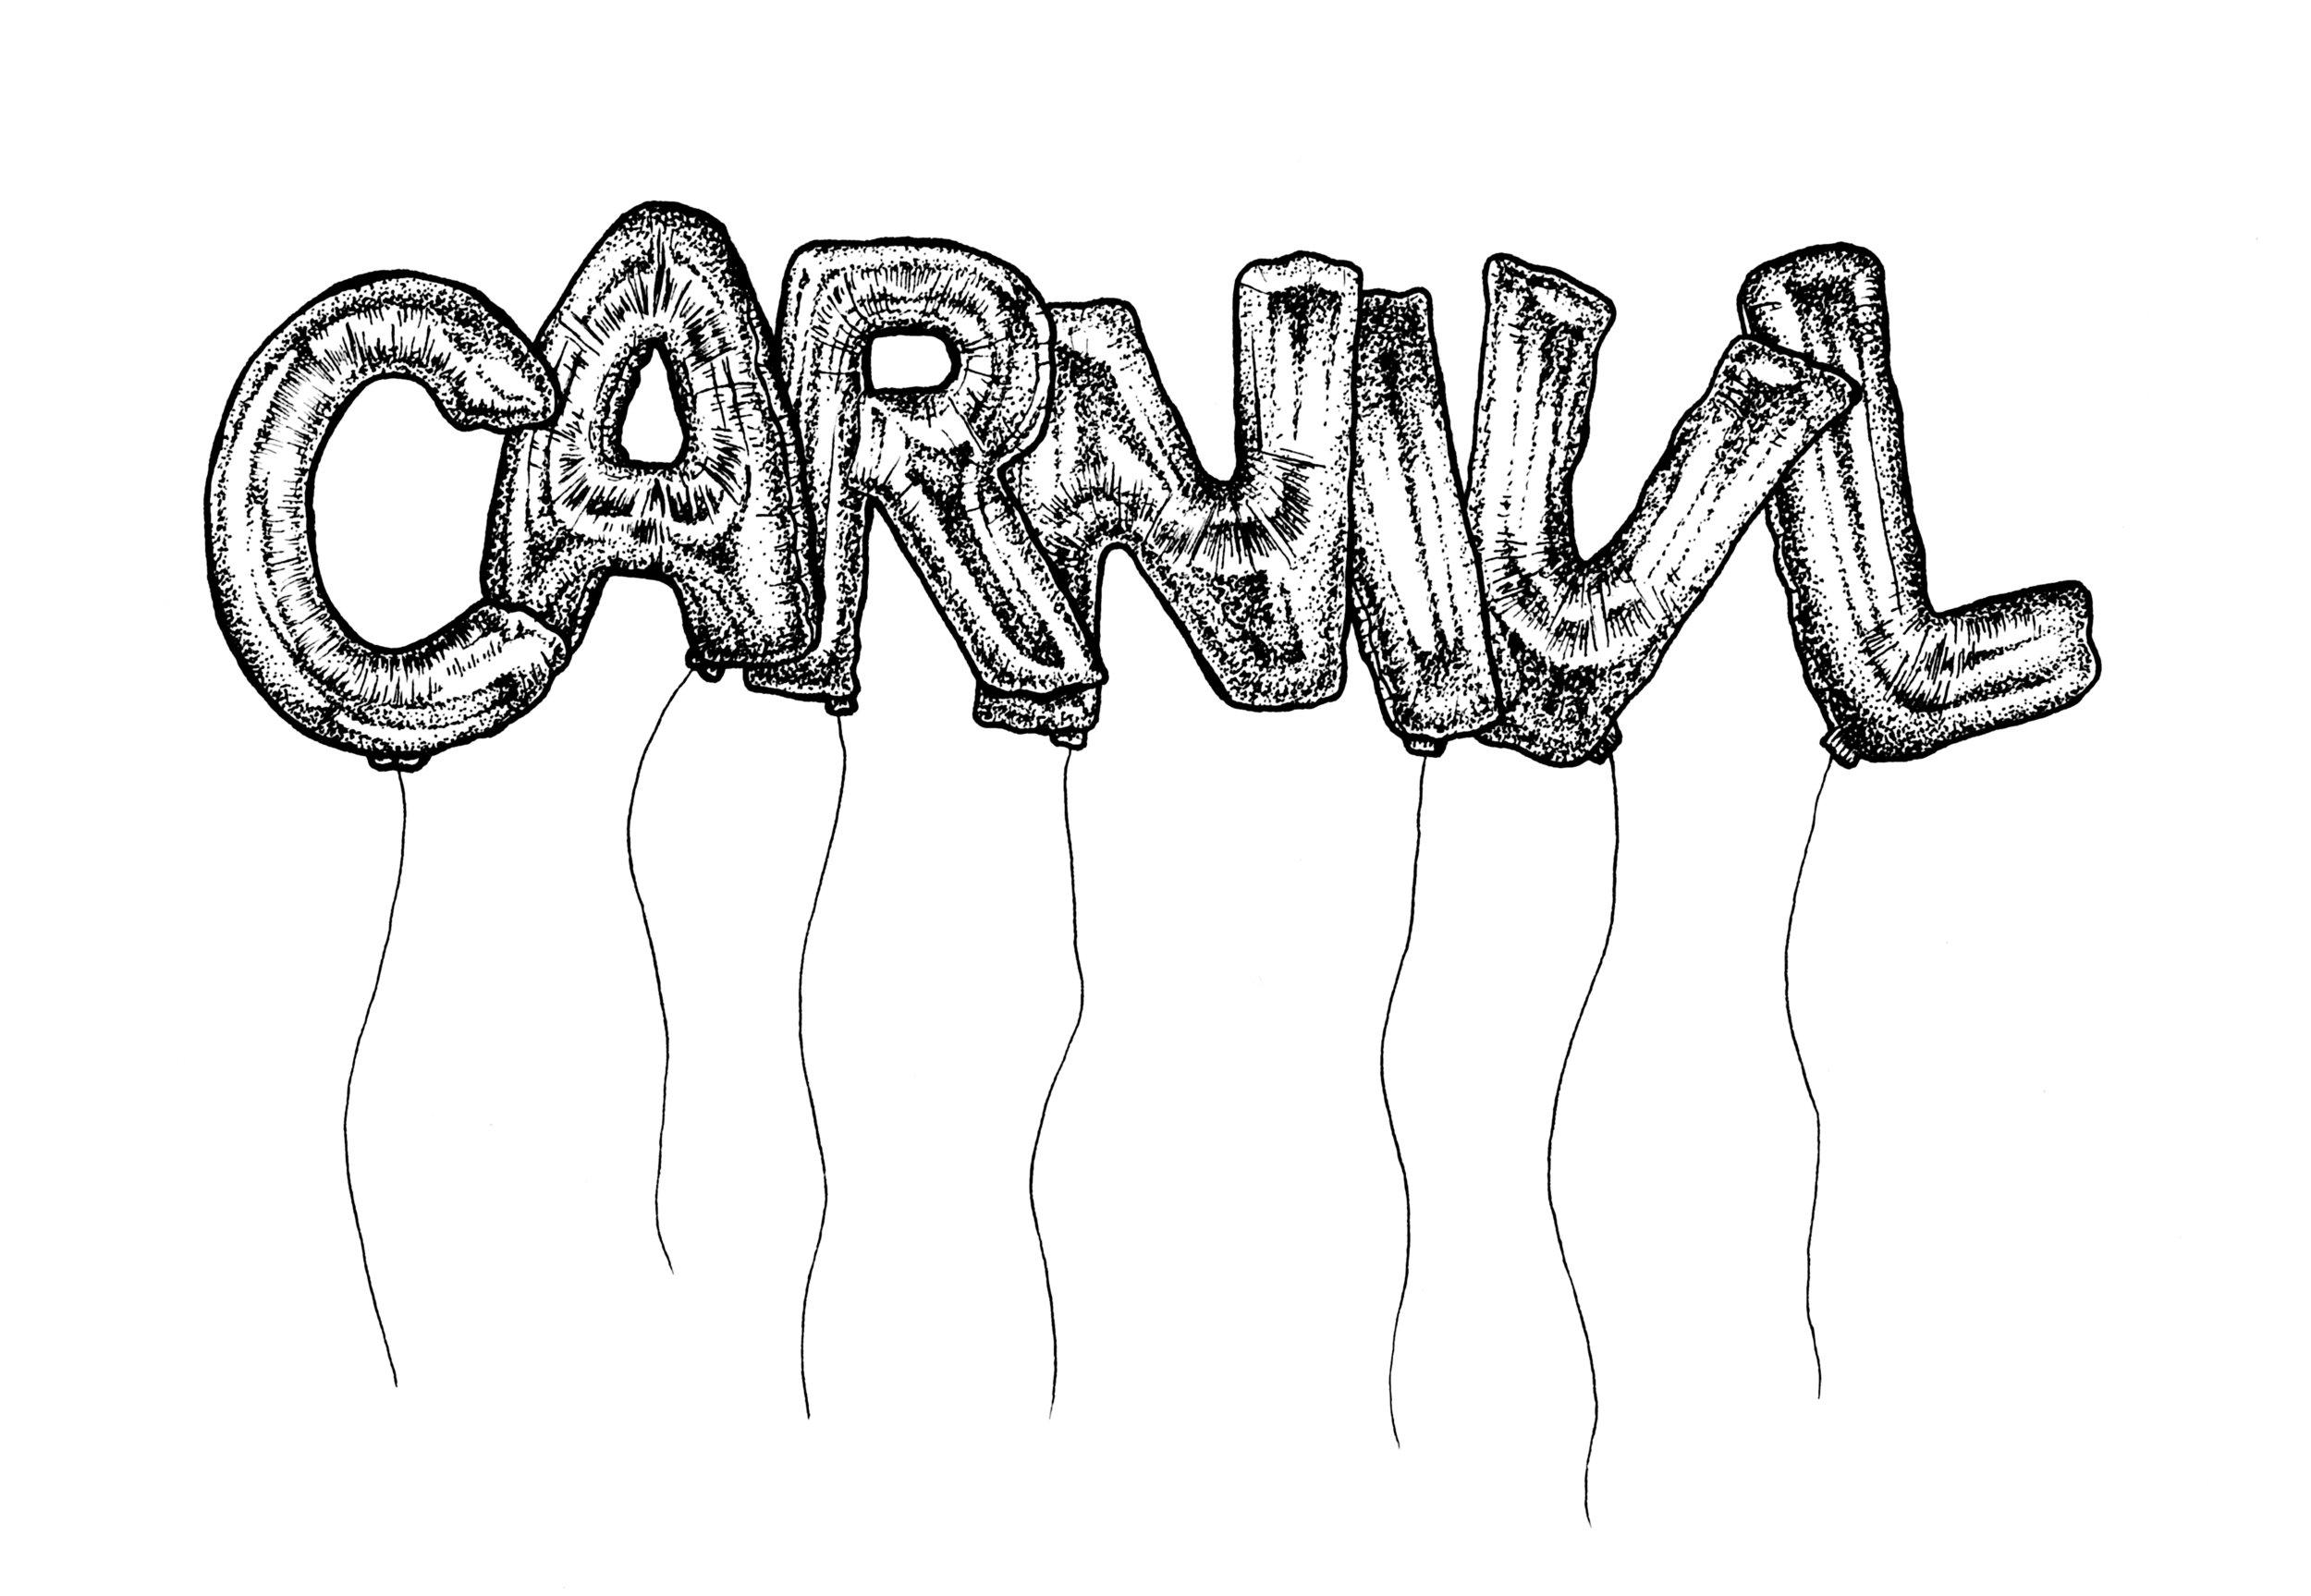 Shirt Design for Carnivl Clothing